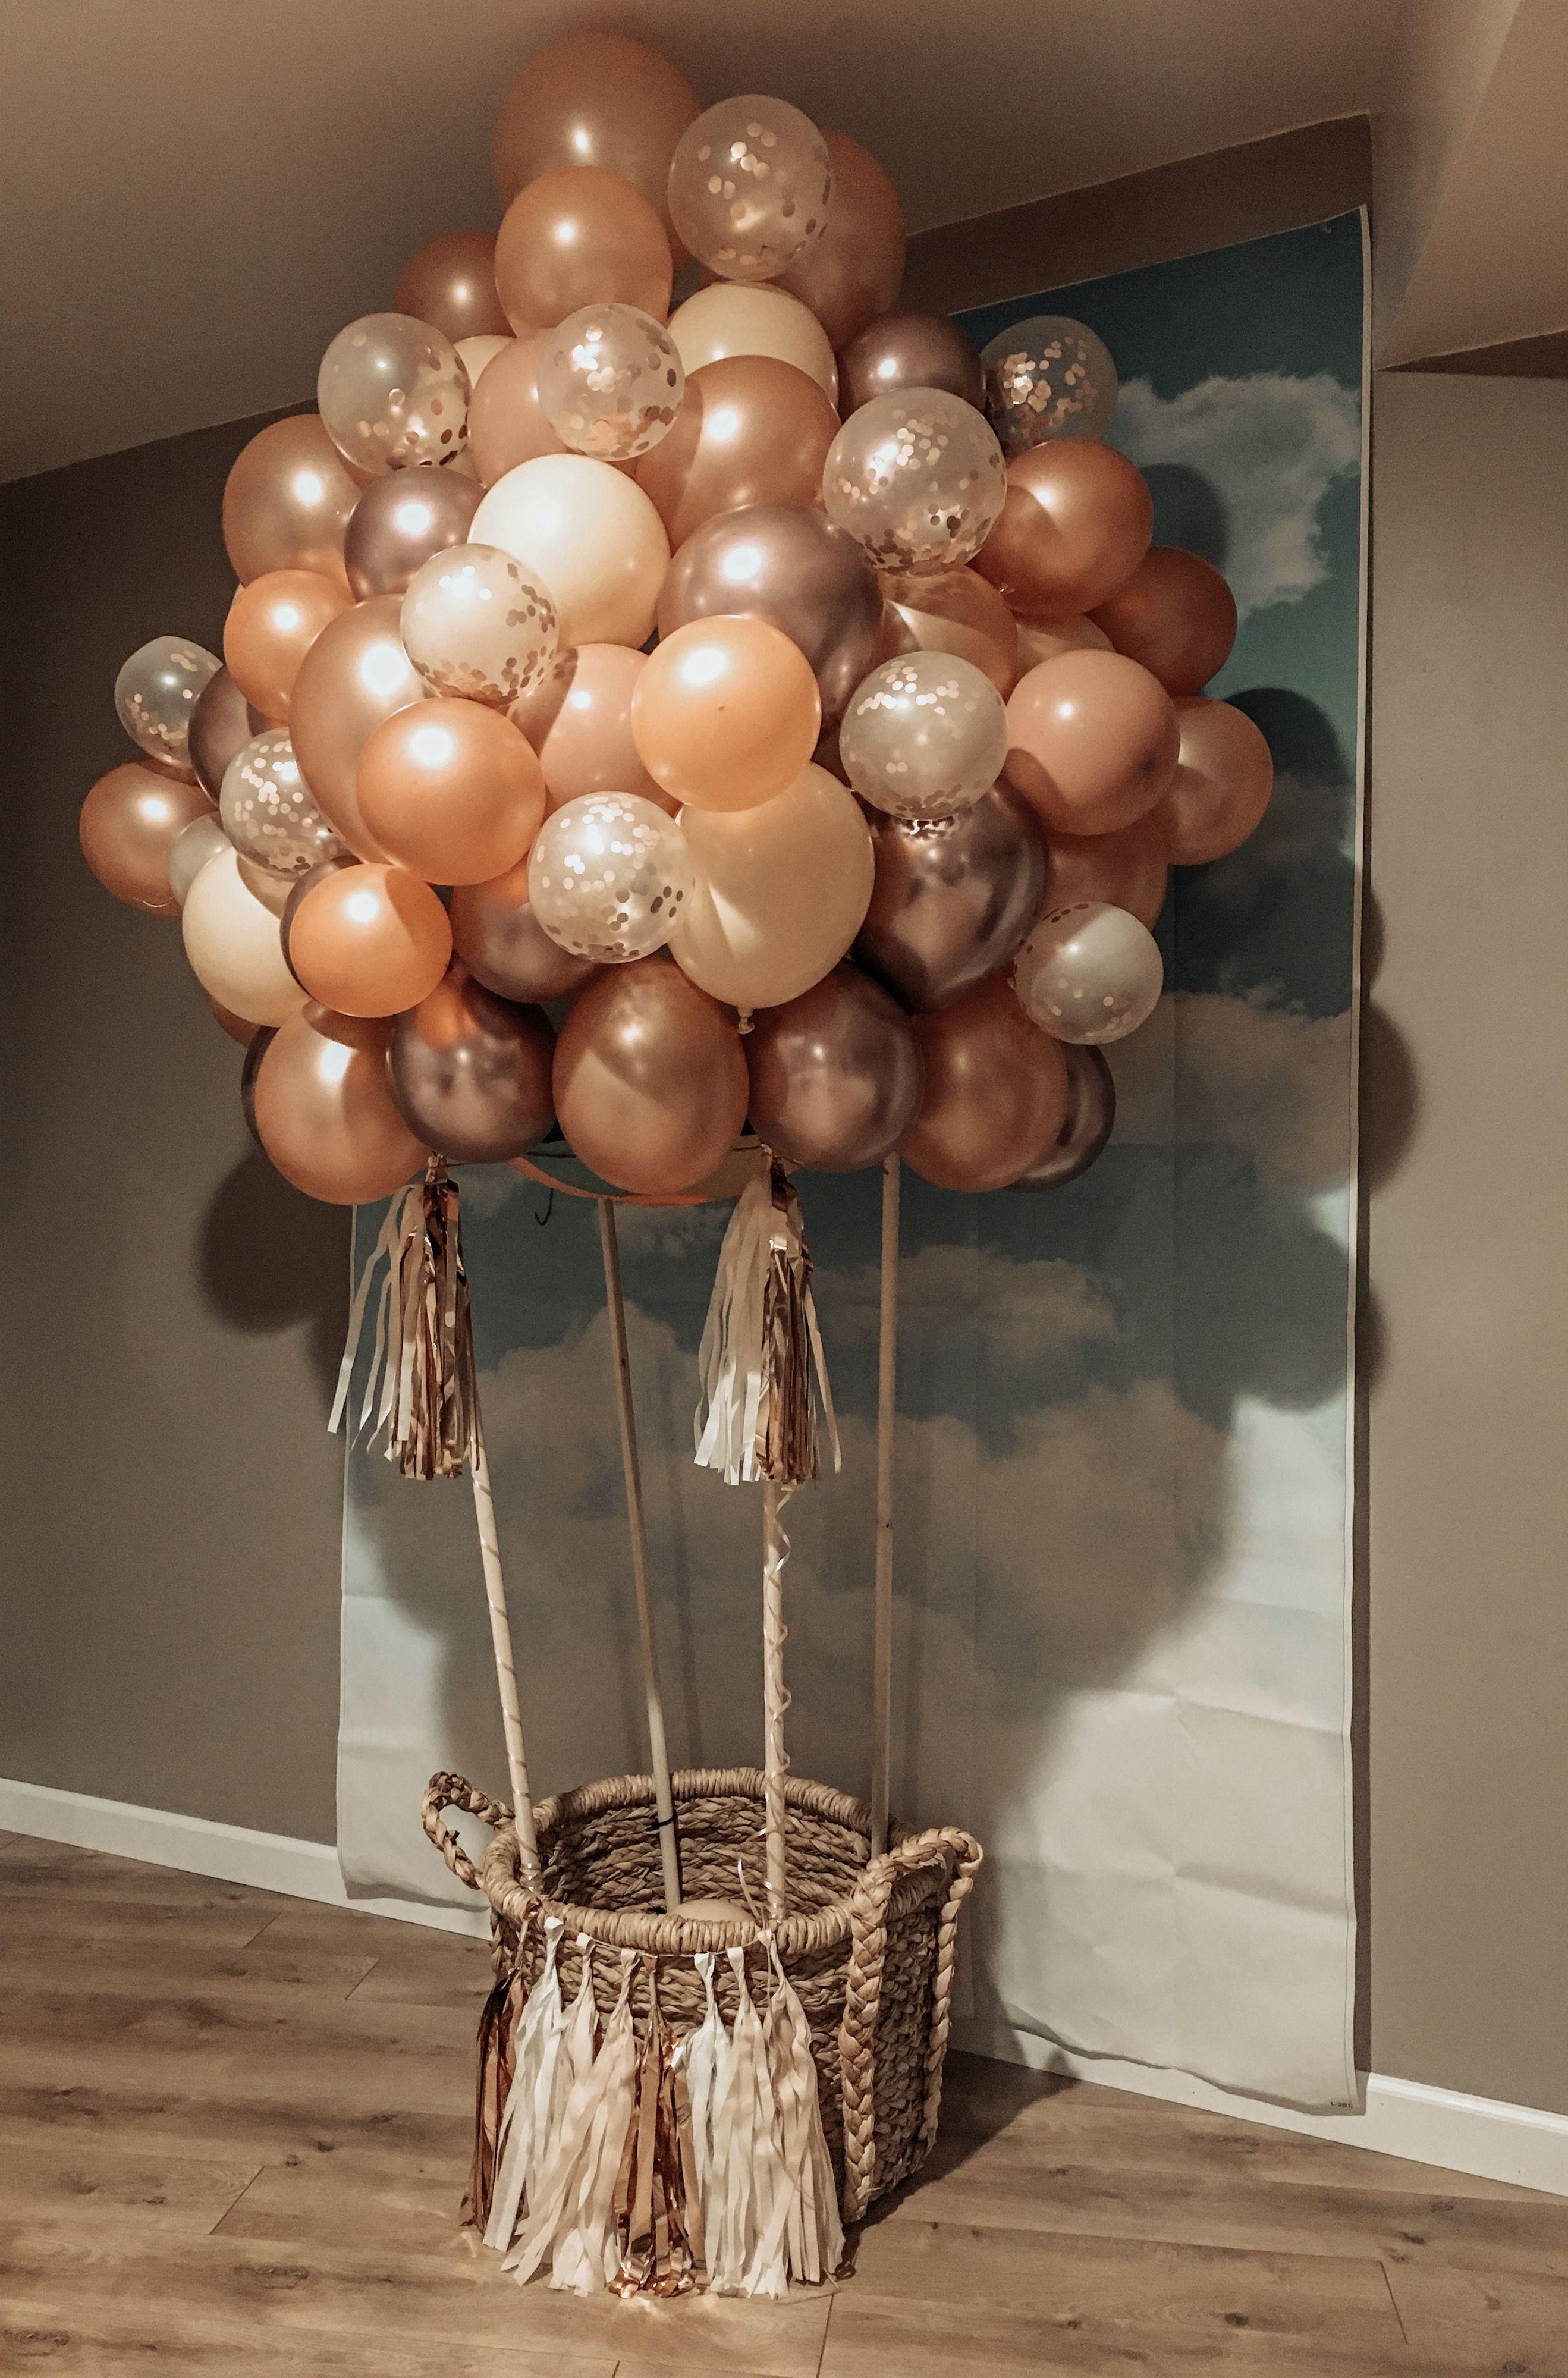 Diy Hot Air Balloon Baby Bell In 2019 Diy Hot Air